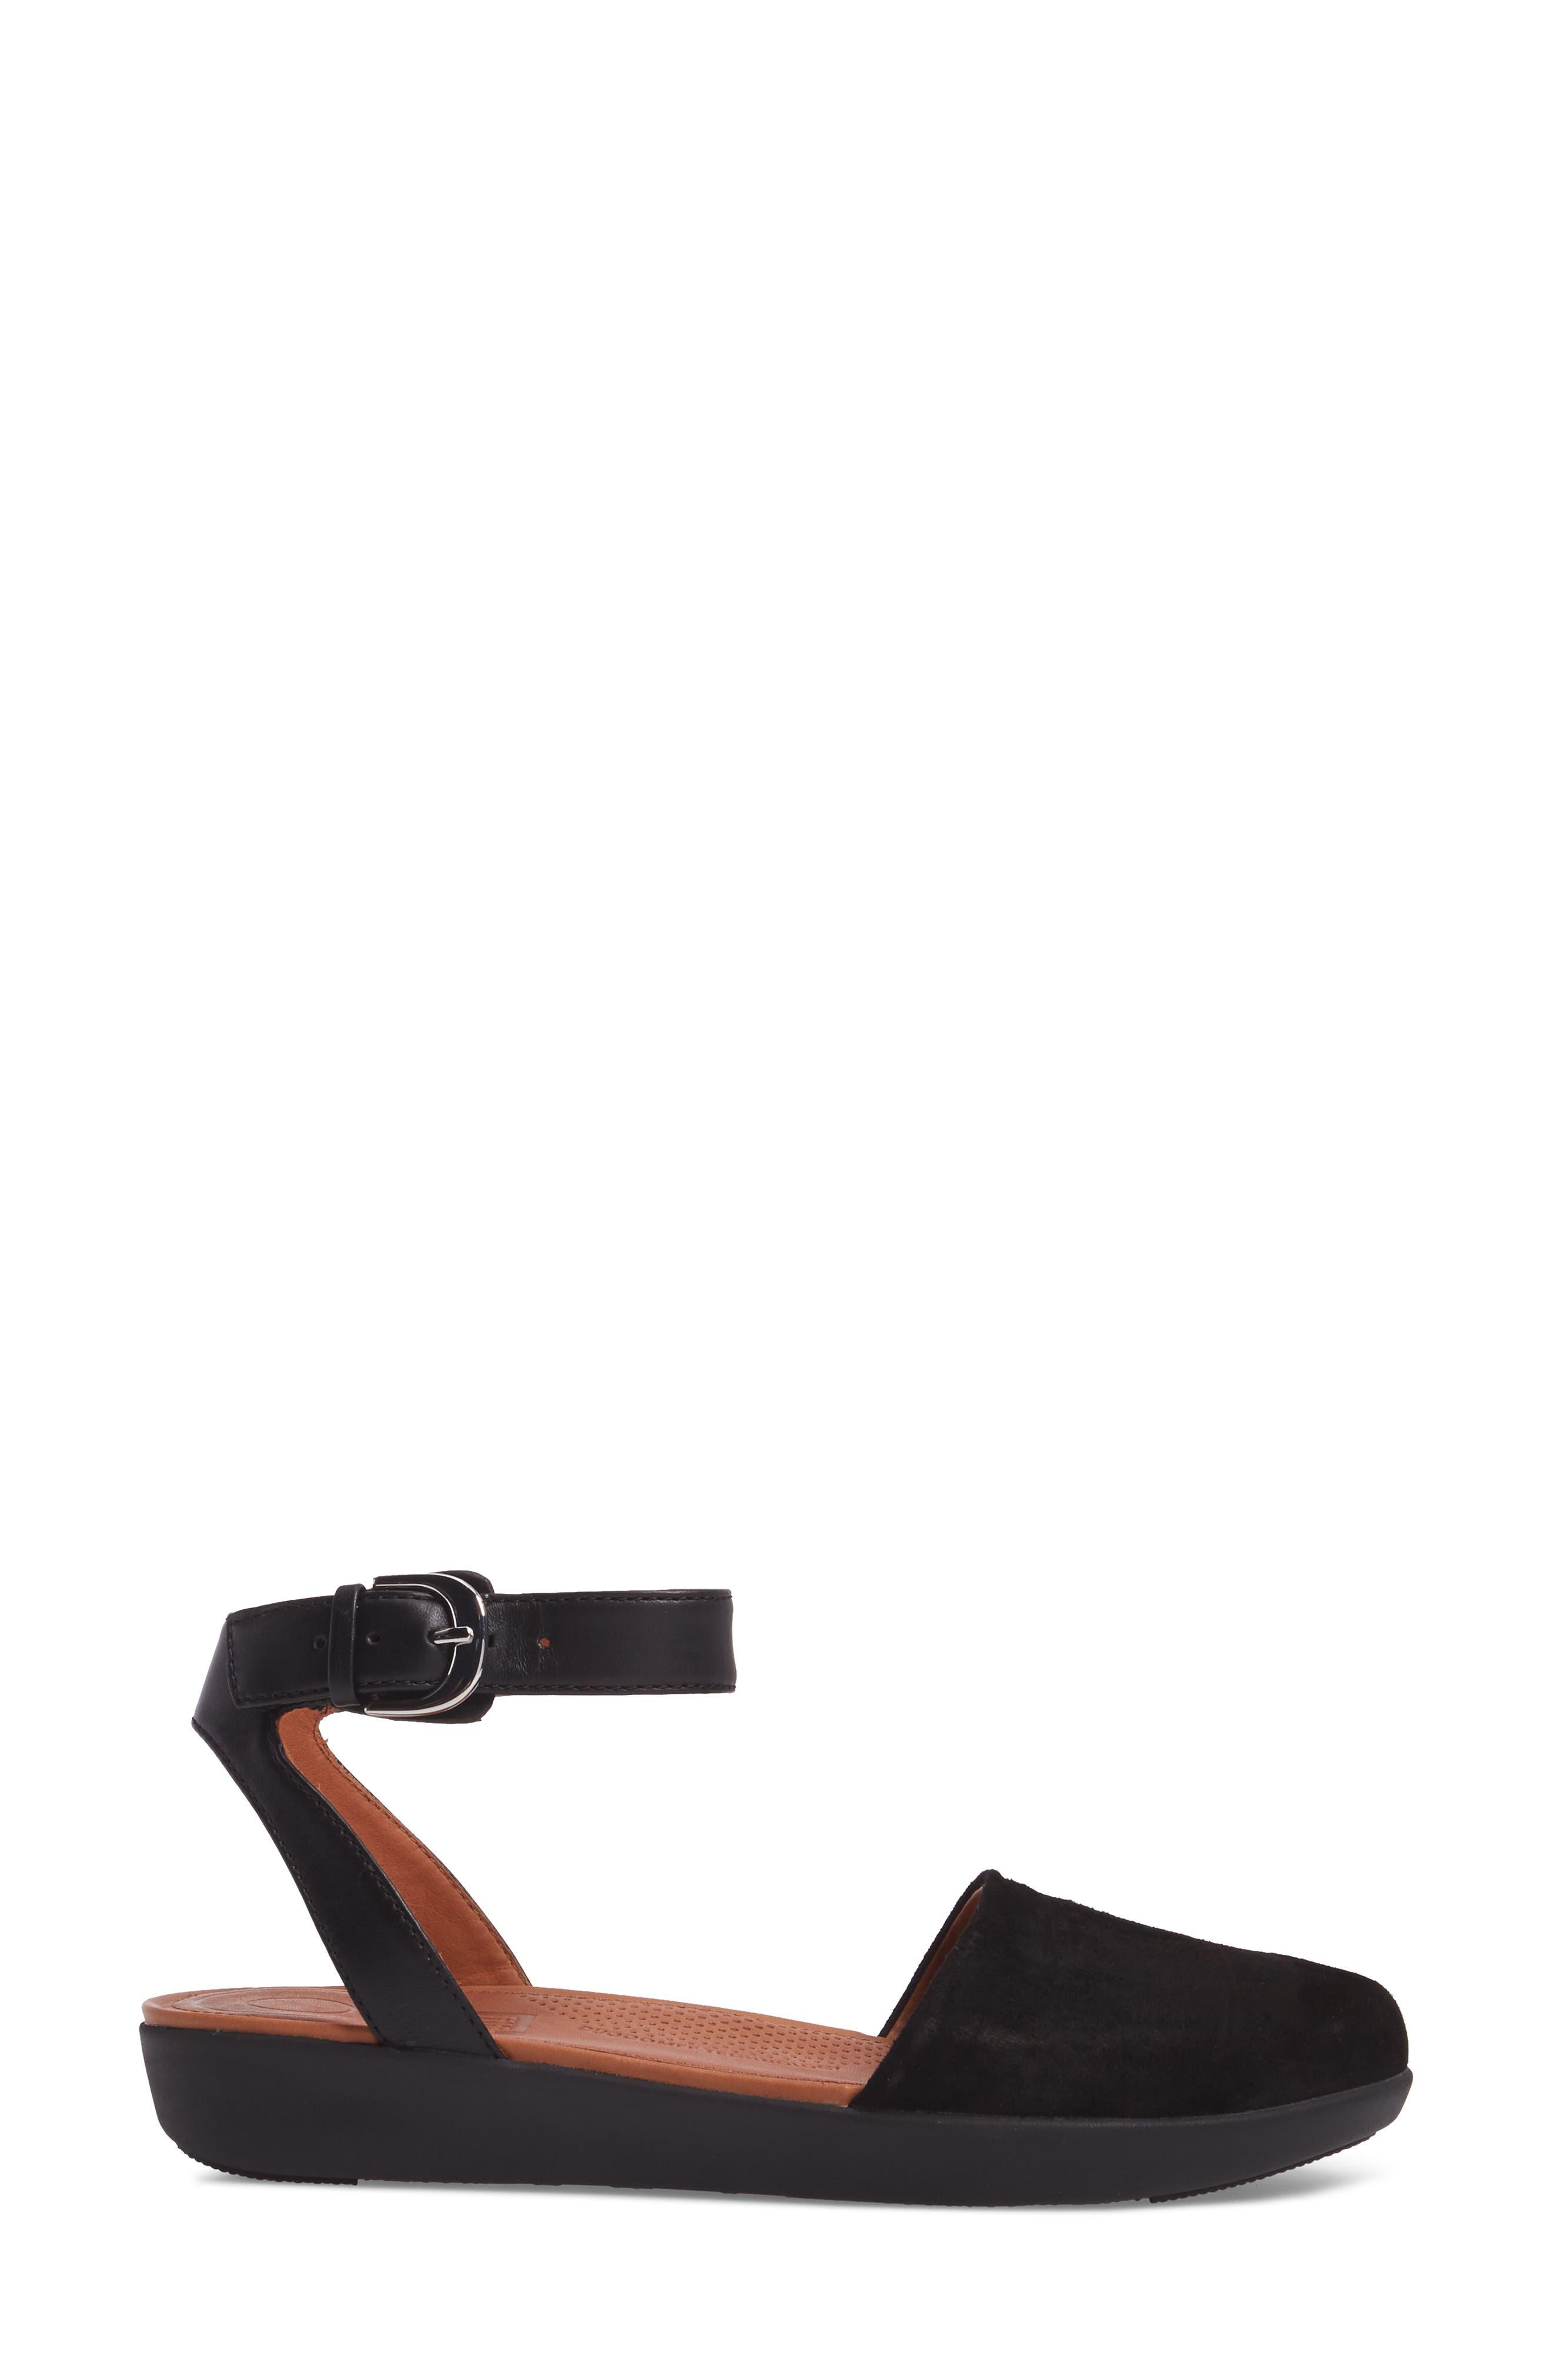 Cova Ankle Strap Sandal,                             Alternate thumbnail 3, color,                             001